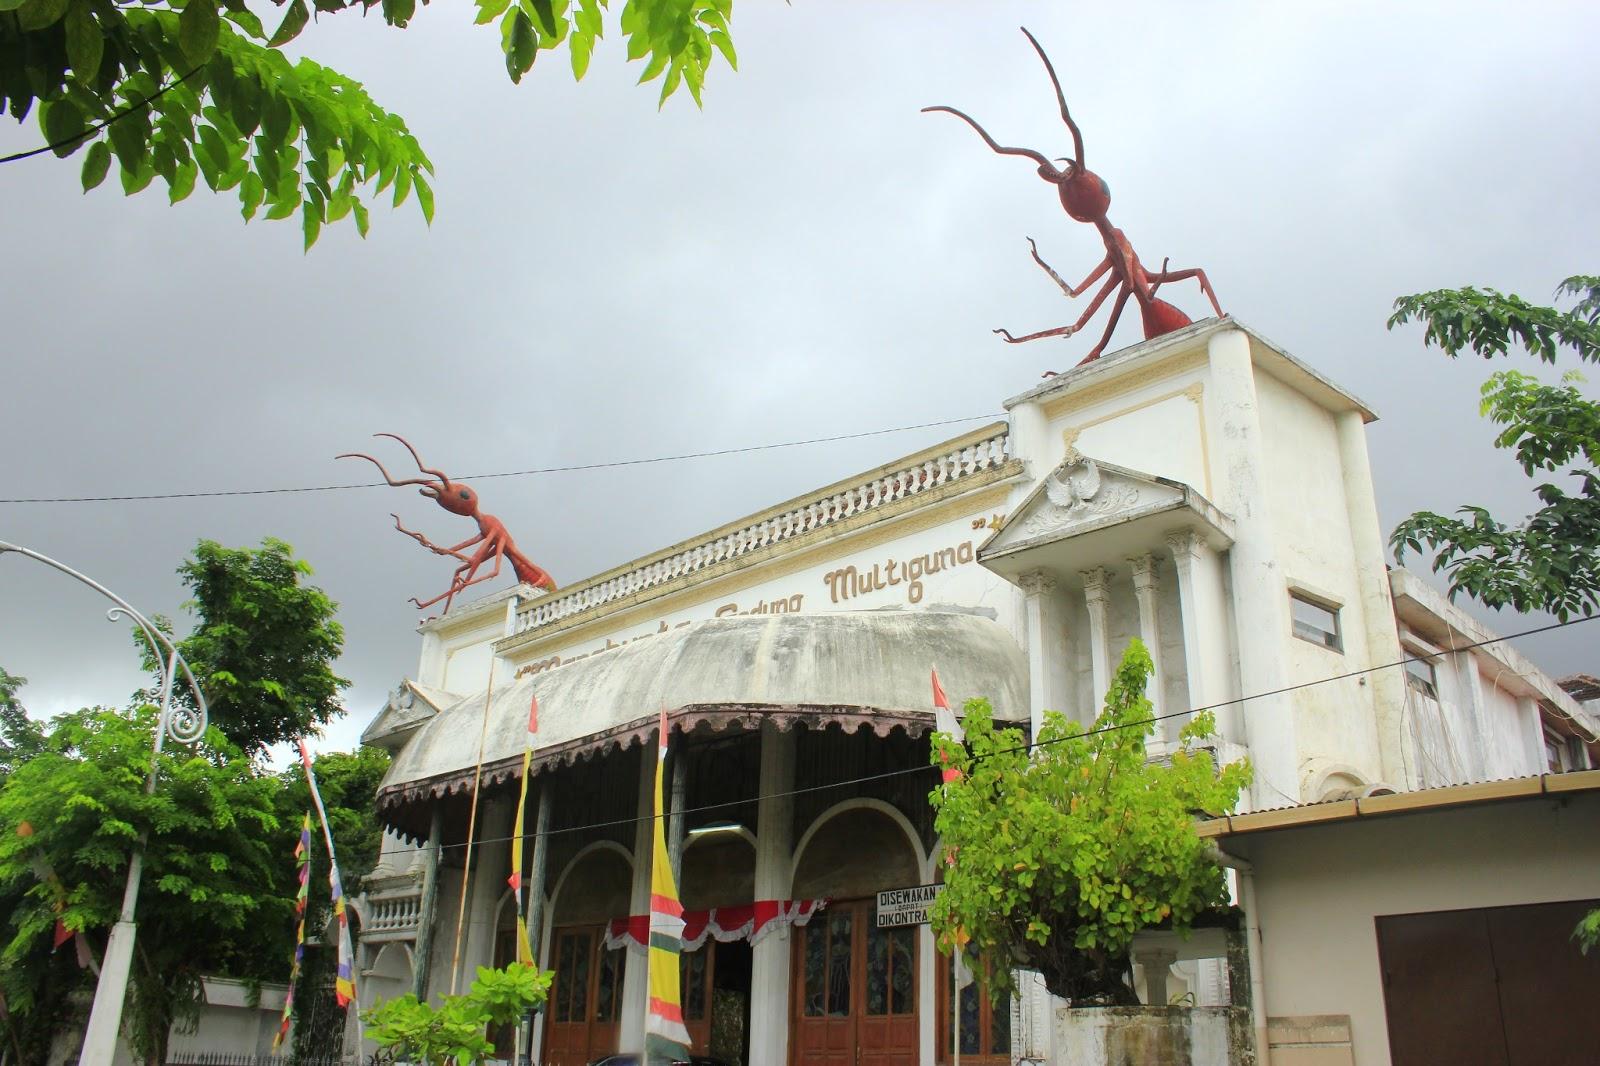 Netherland Ala Kota Semarang Ardiyanta Pula Satu Ikon Bangunan Patung